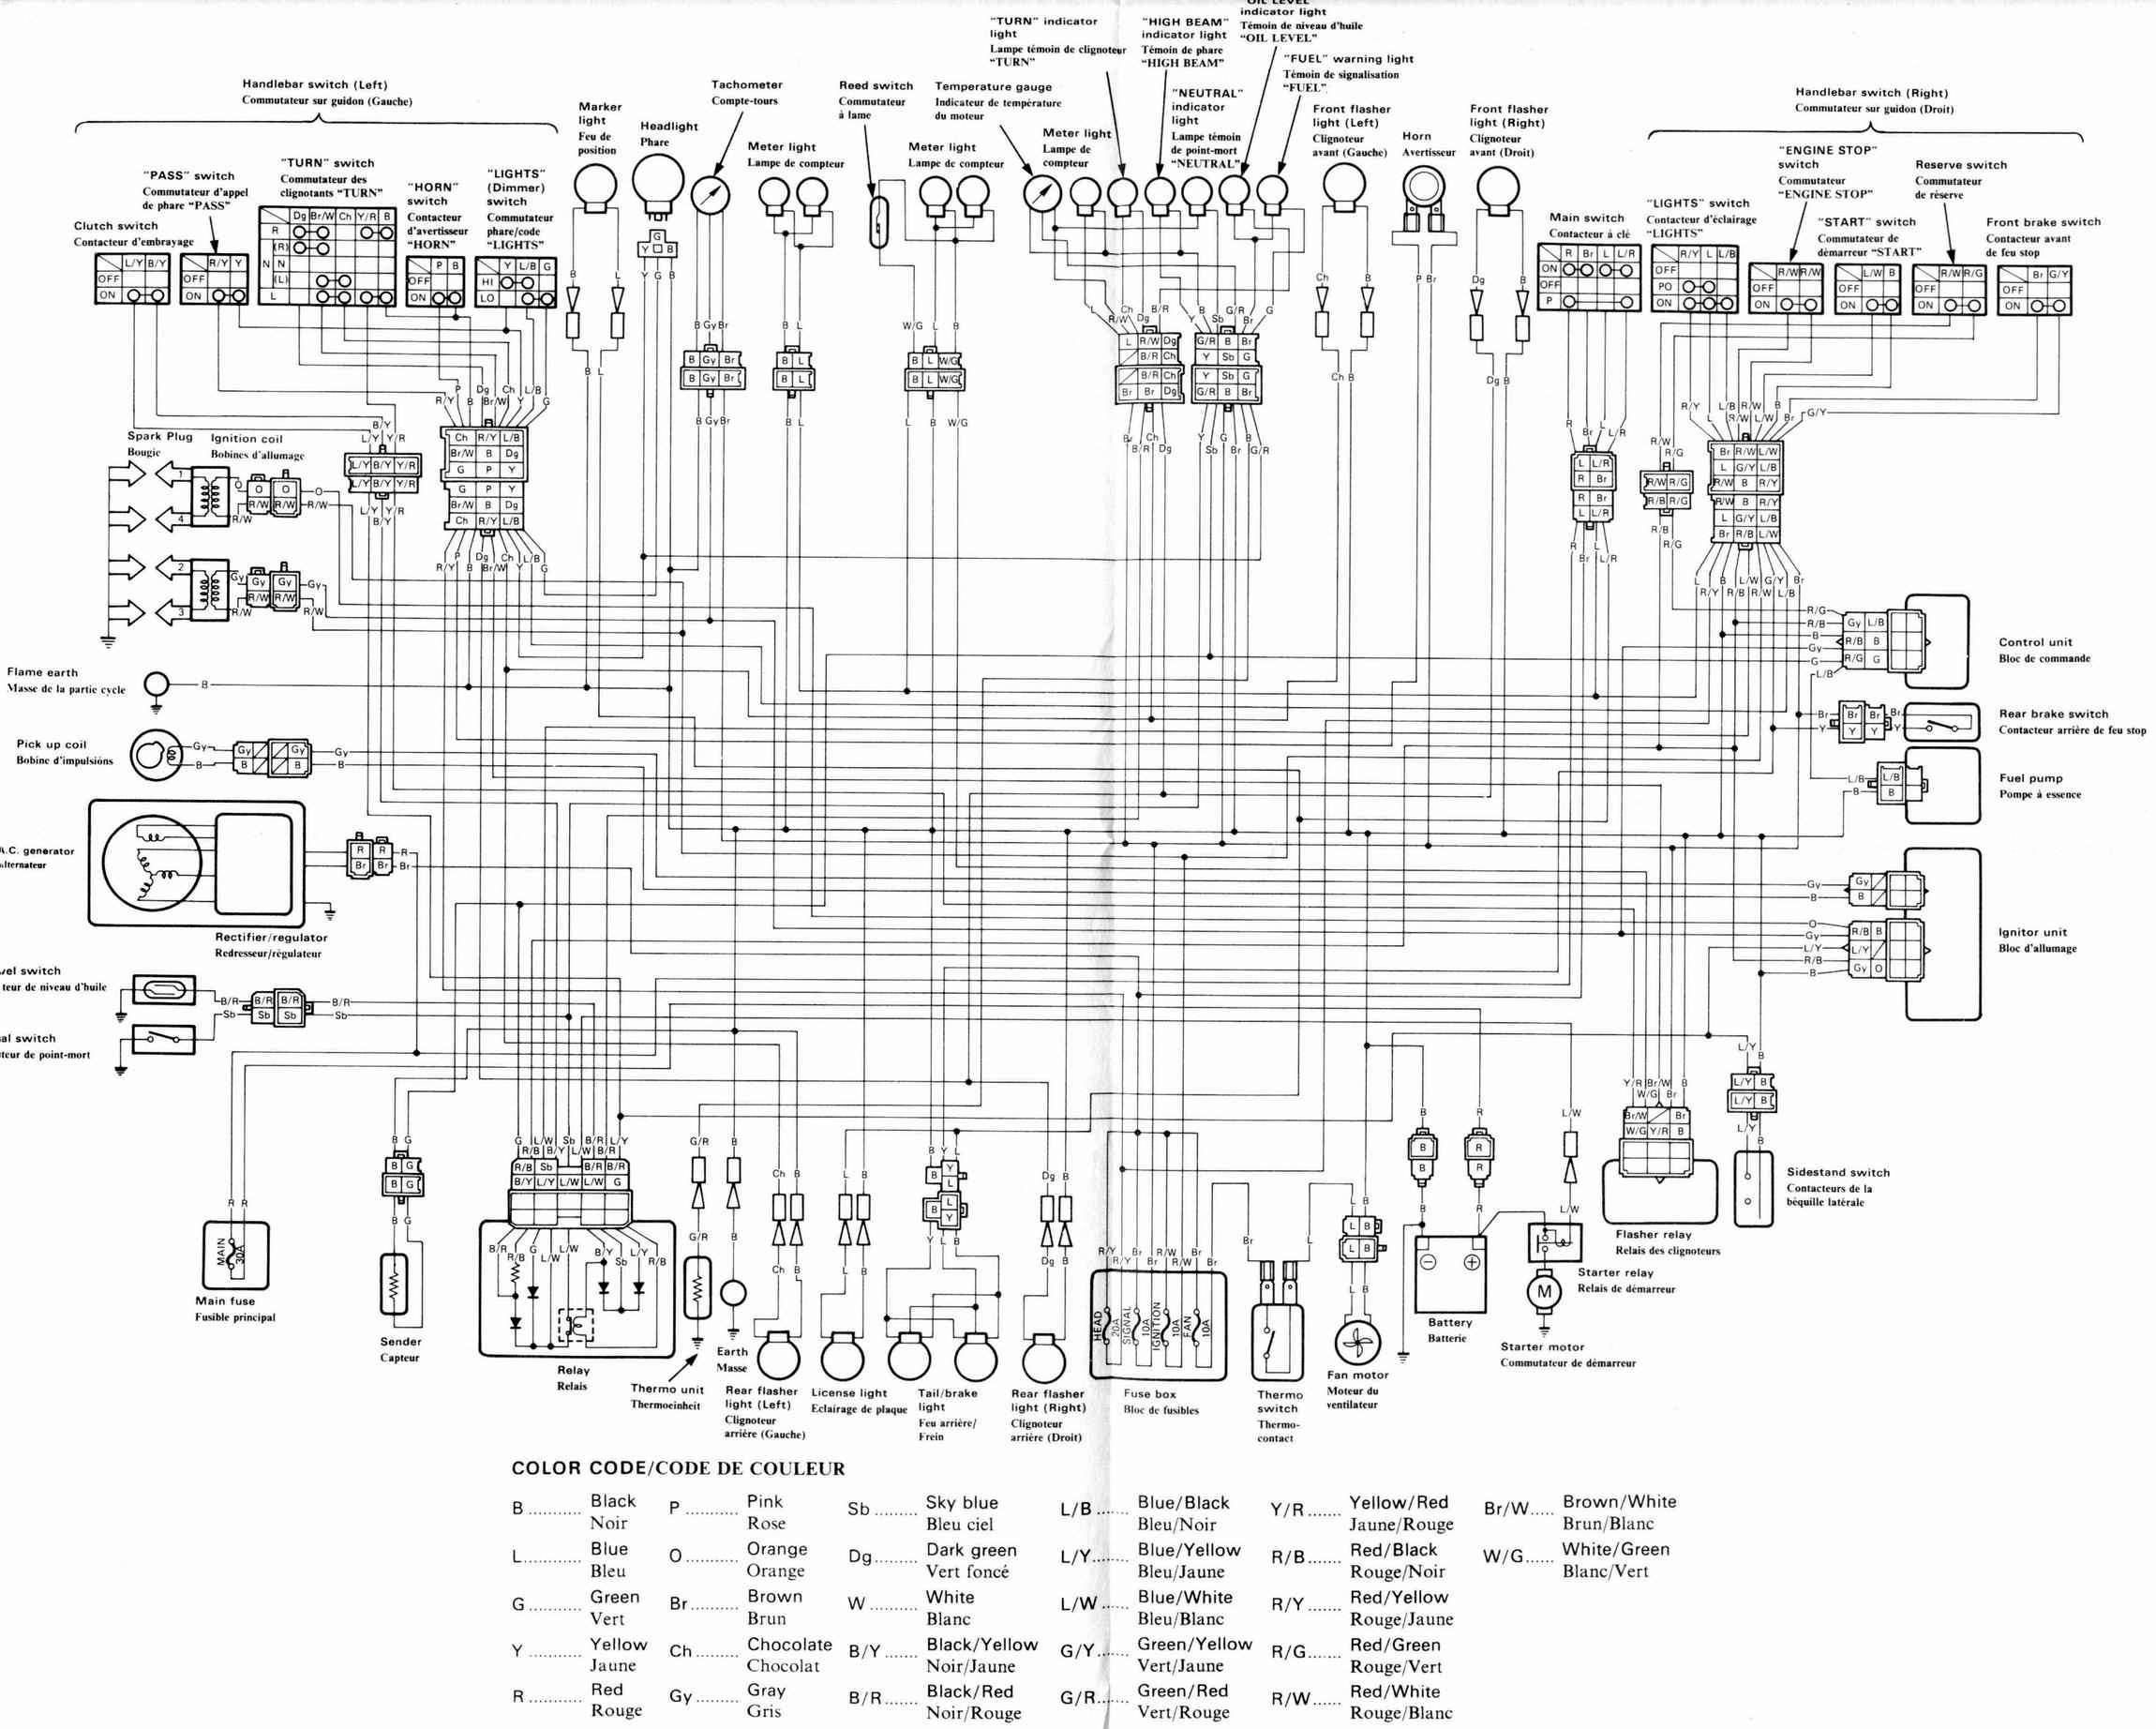 fzx700 yamaha wiring diagram